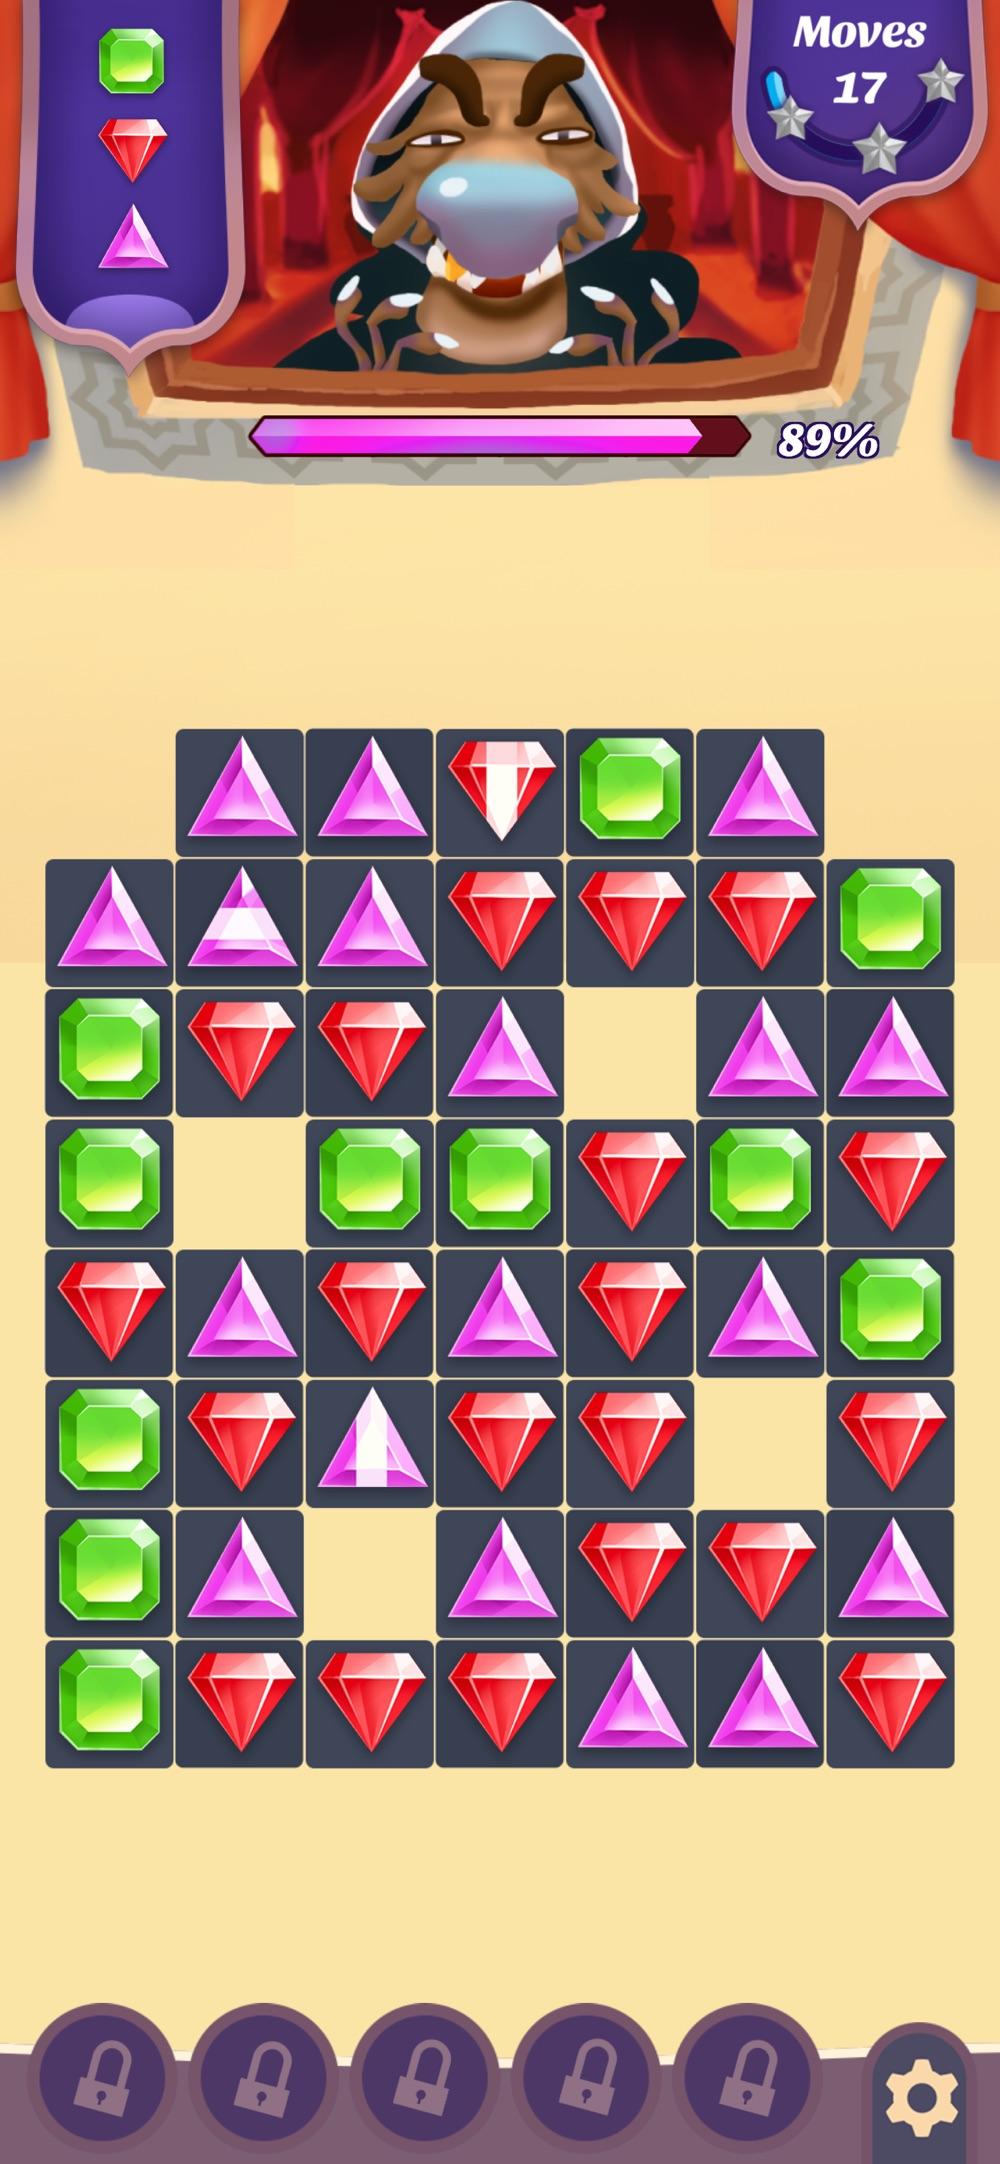 Jewel King: Diamond Smash hack tool